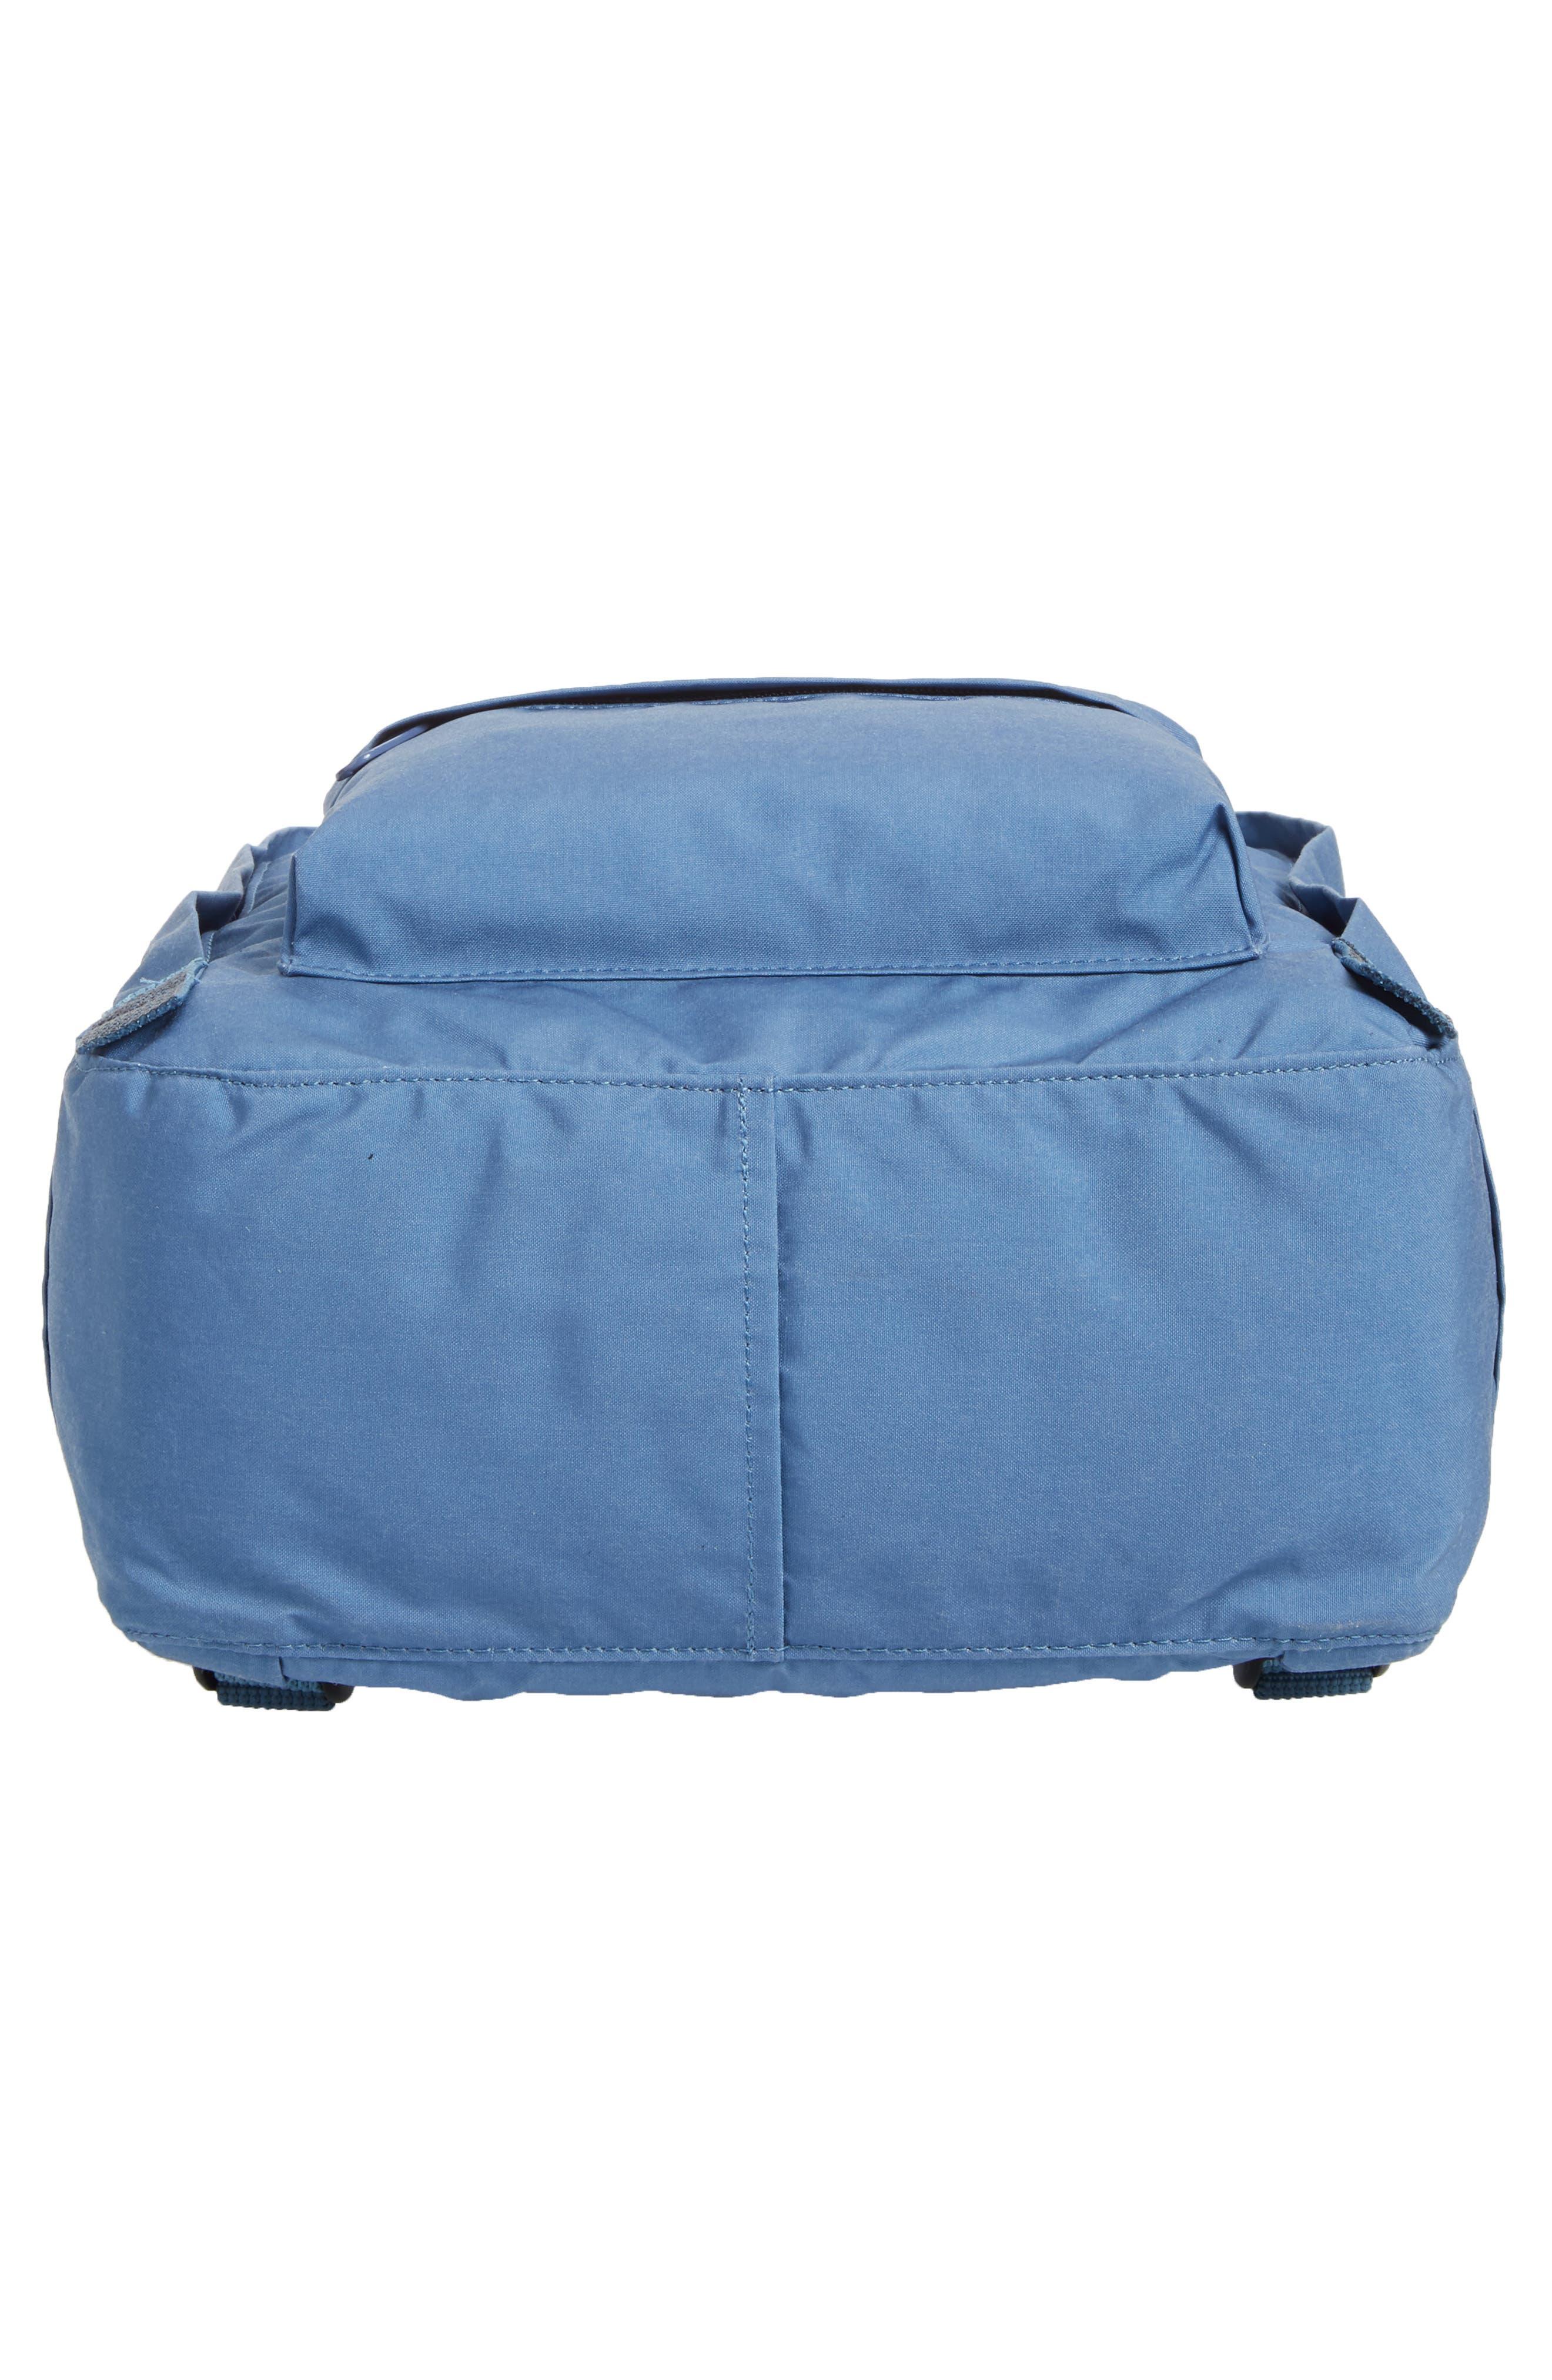 'Kånken' Water Resistant Backpack,                             Alternate thumbnail 4, color,                             Blue Ridge/ Random Blocked